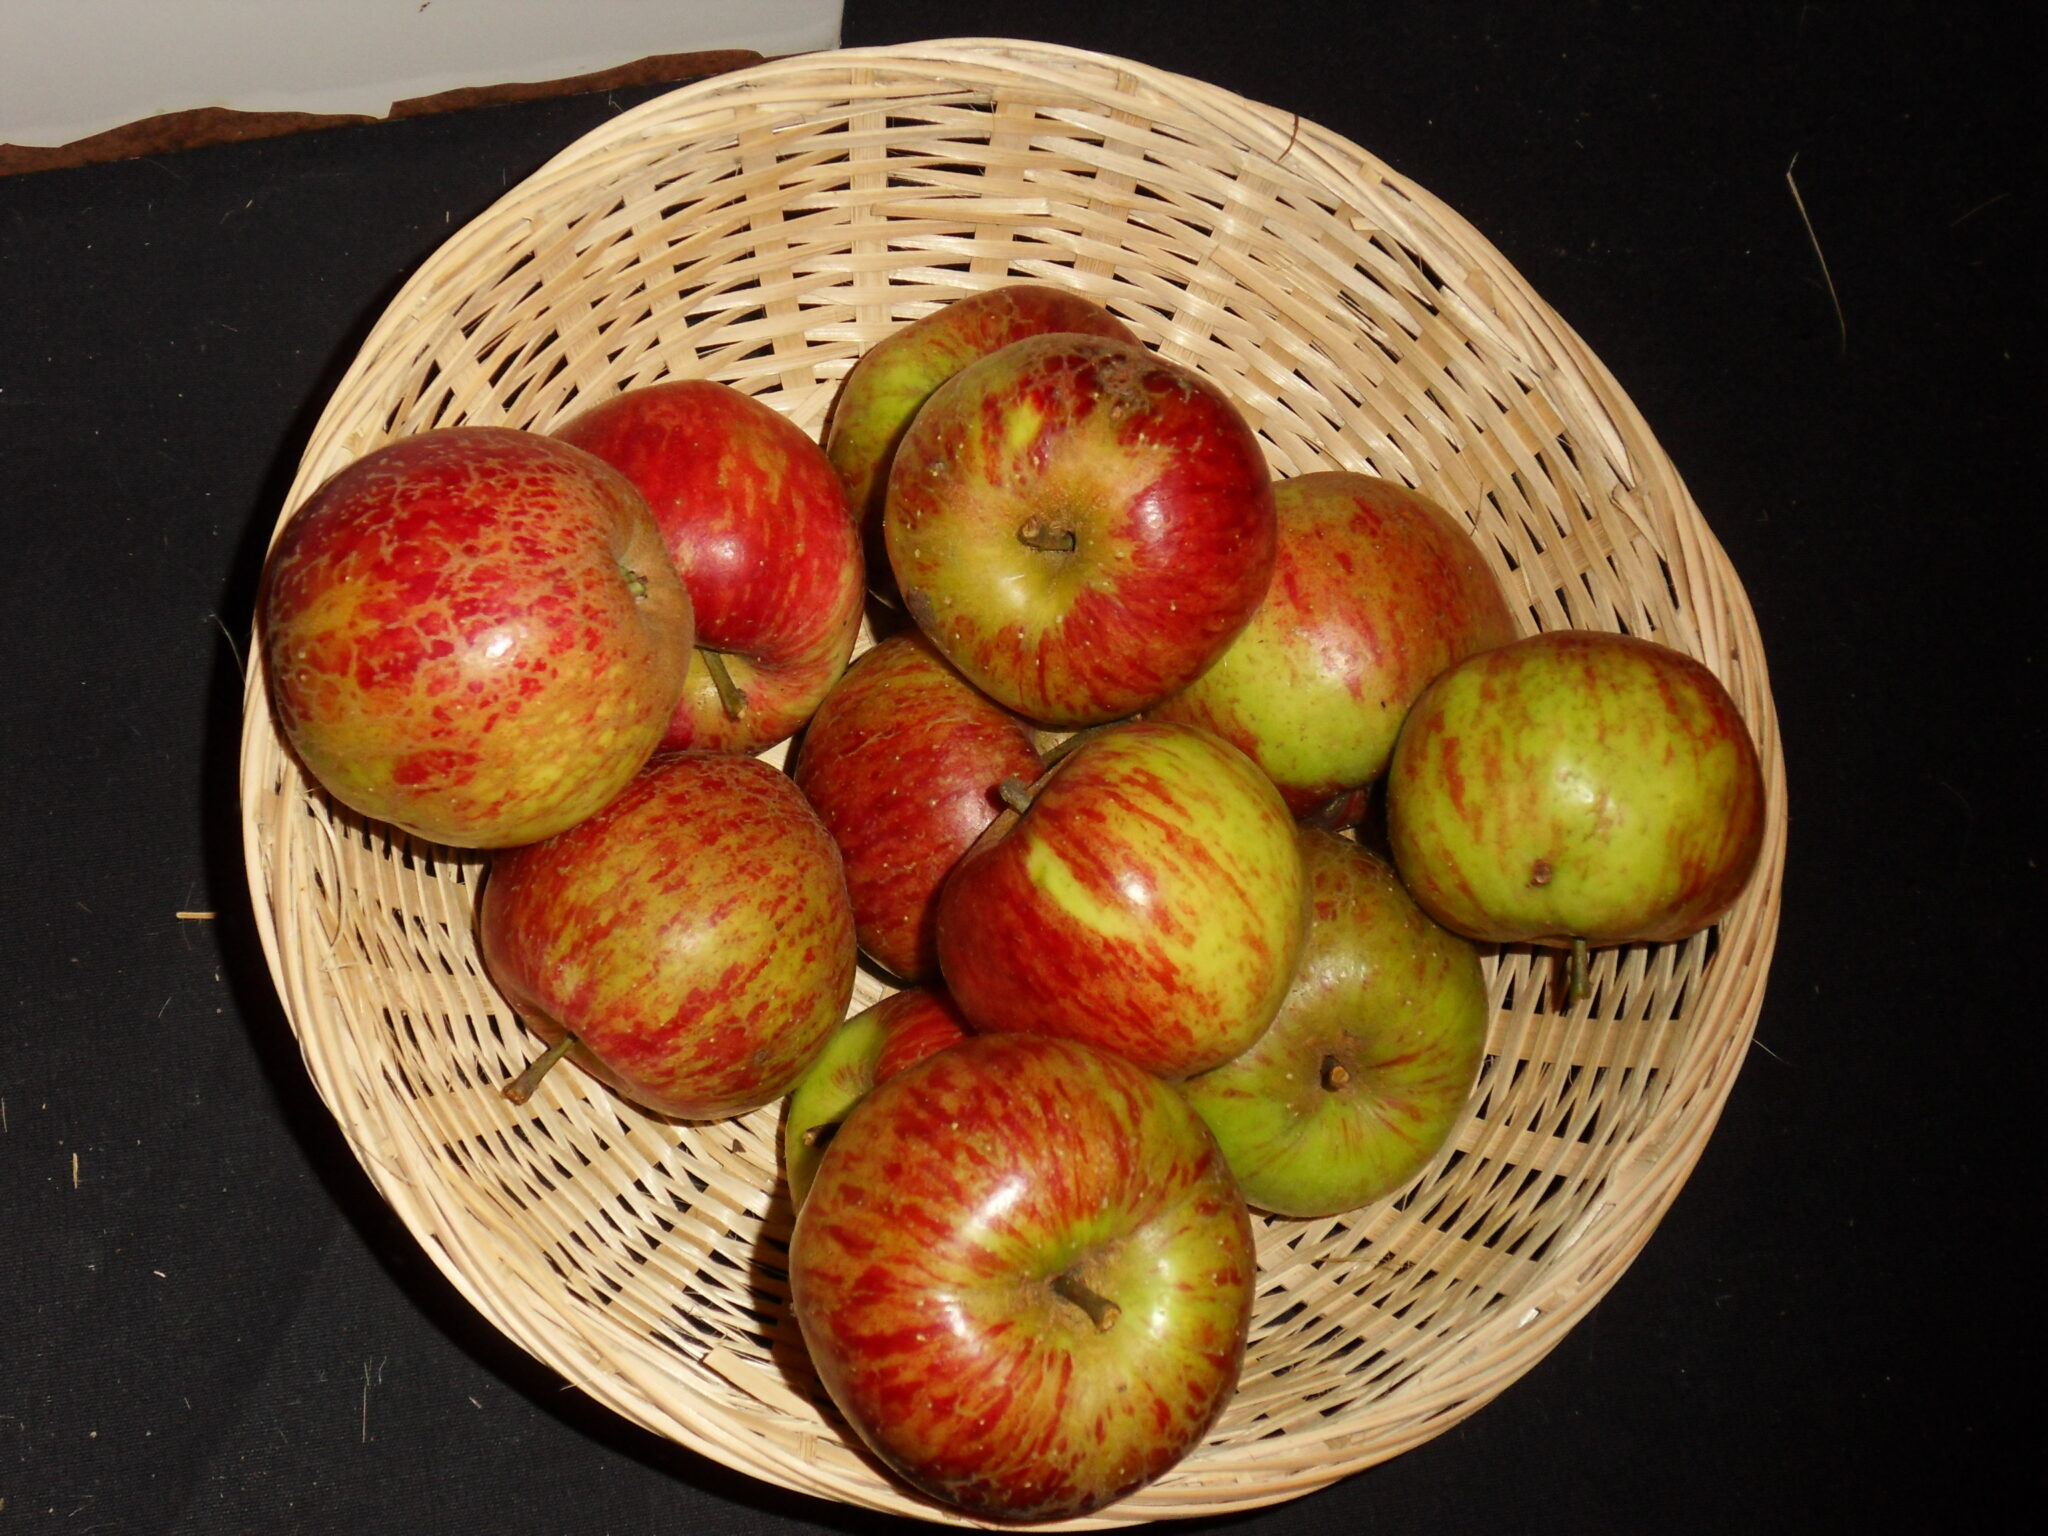 Chailleux 2 (fruit).